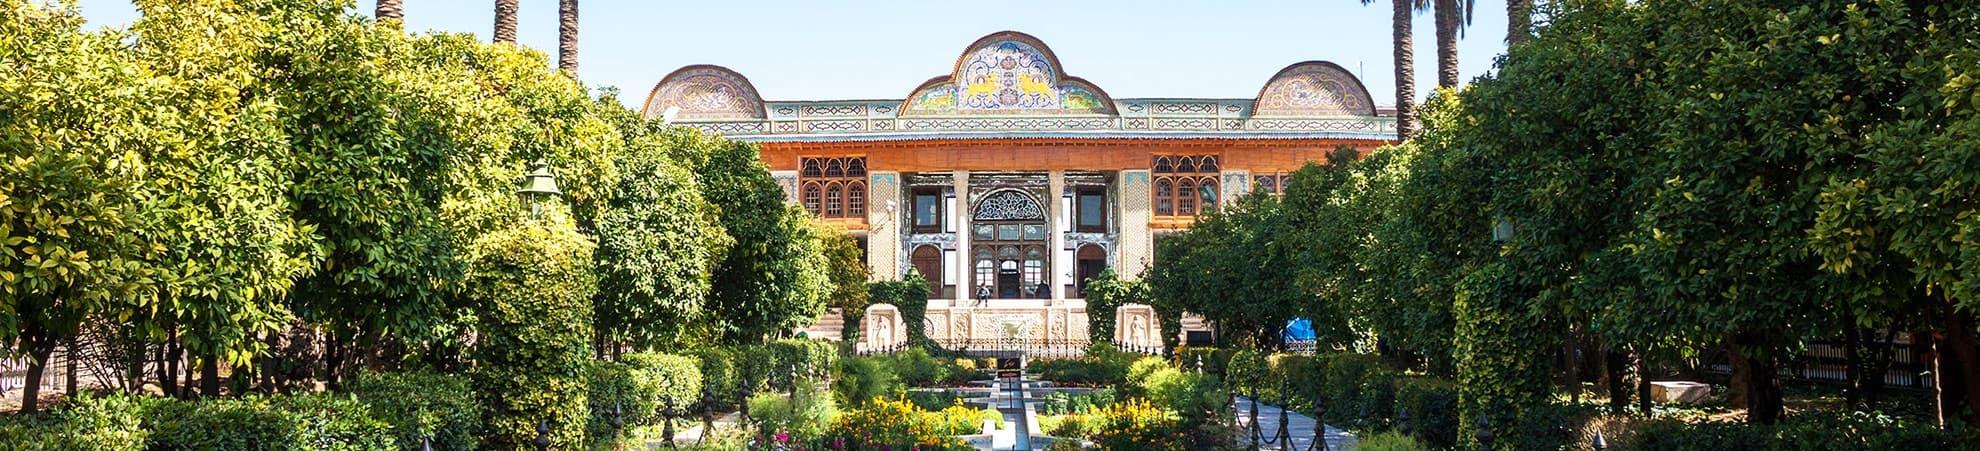 Voyage Le Centre de l'Iran